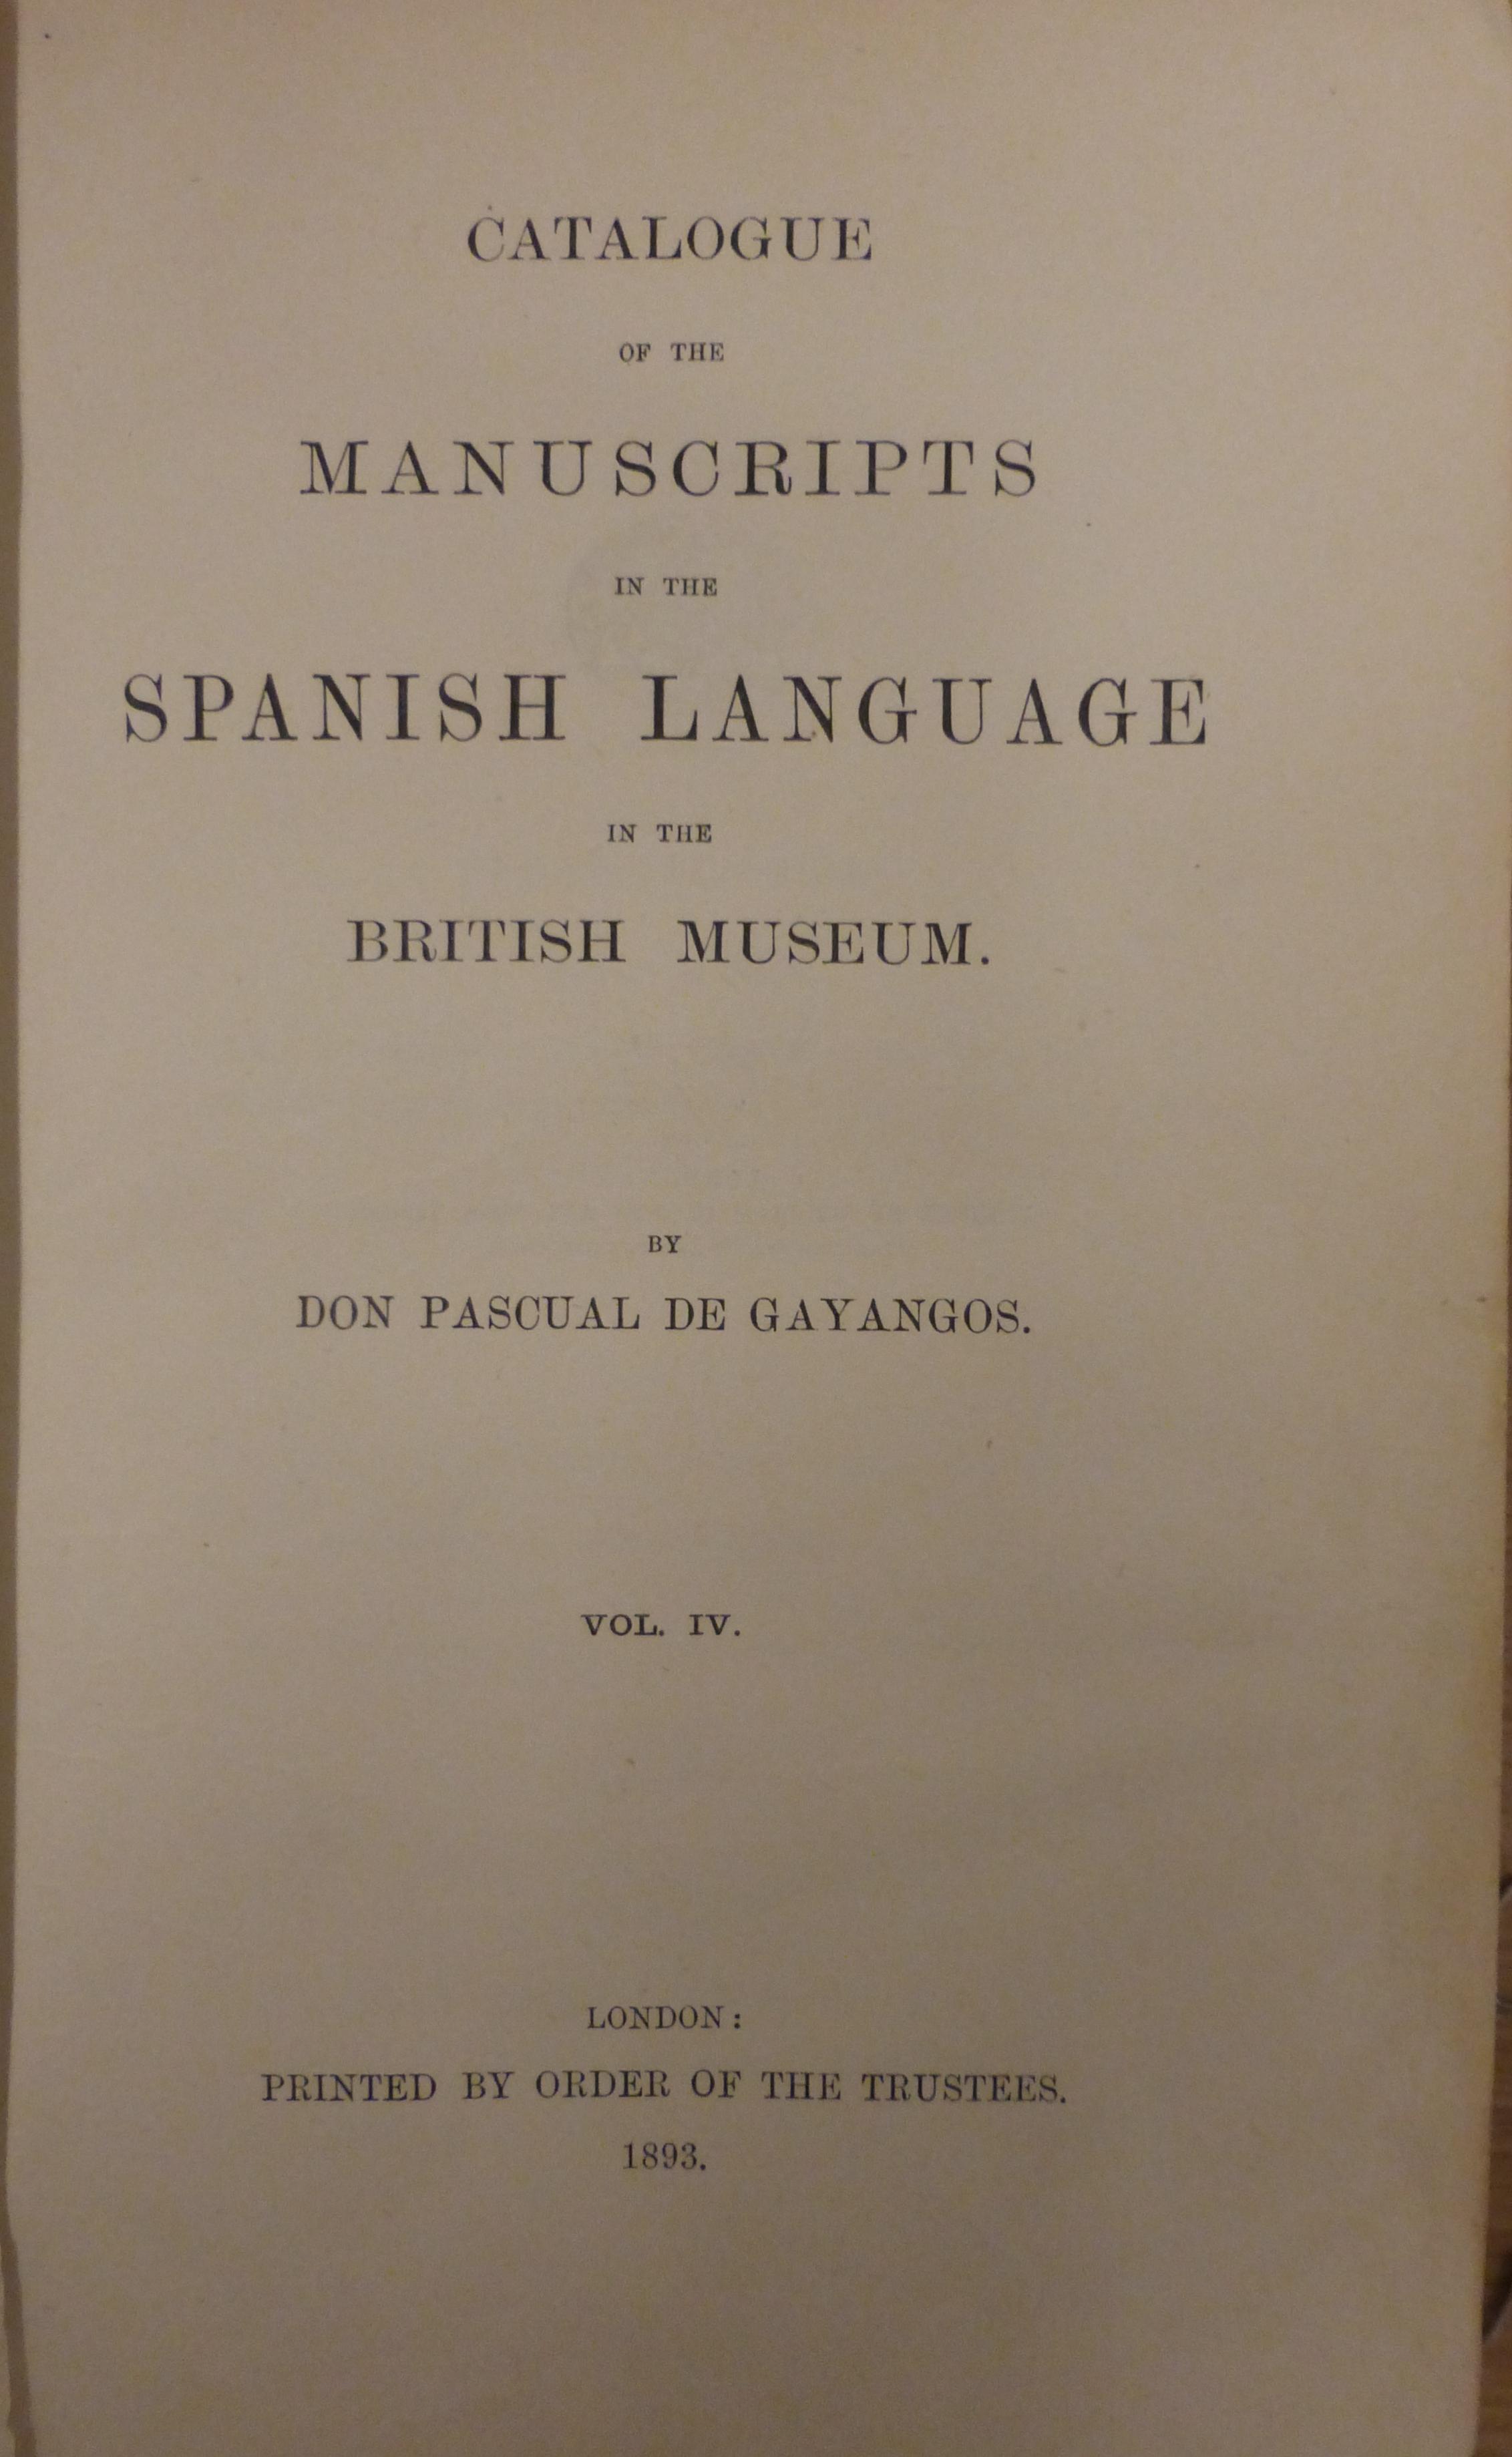 European studies blog: Manuscripts